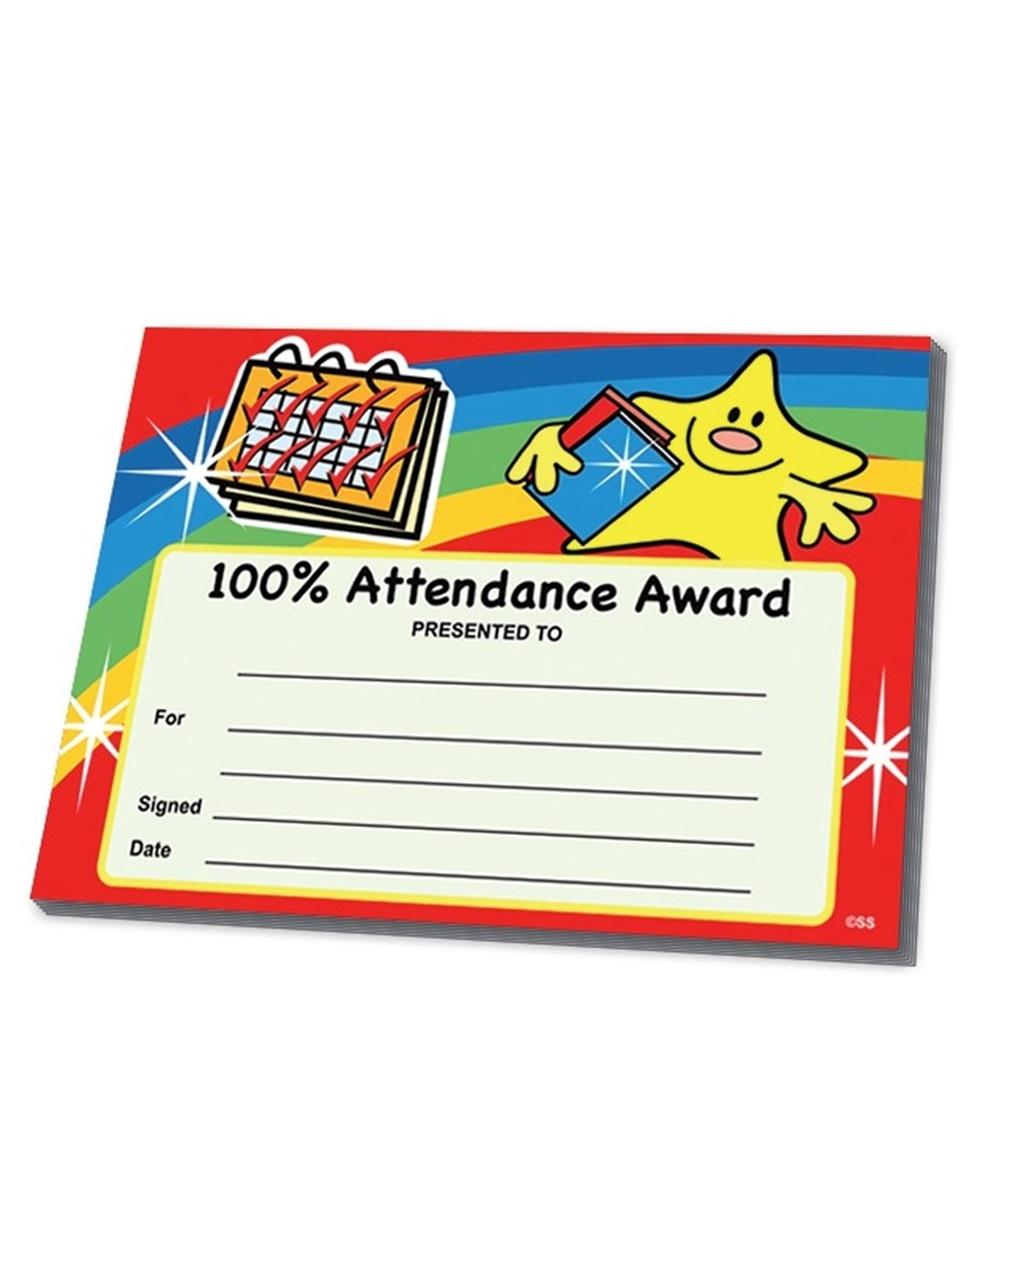 Certifcates - 100% Attendance